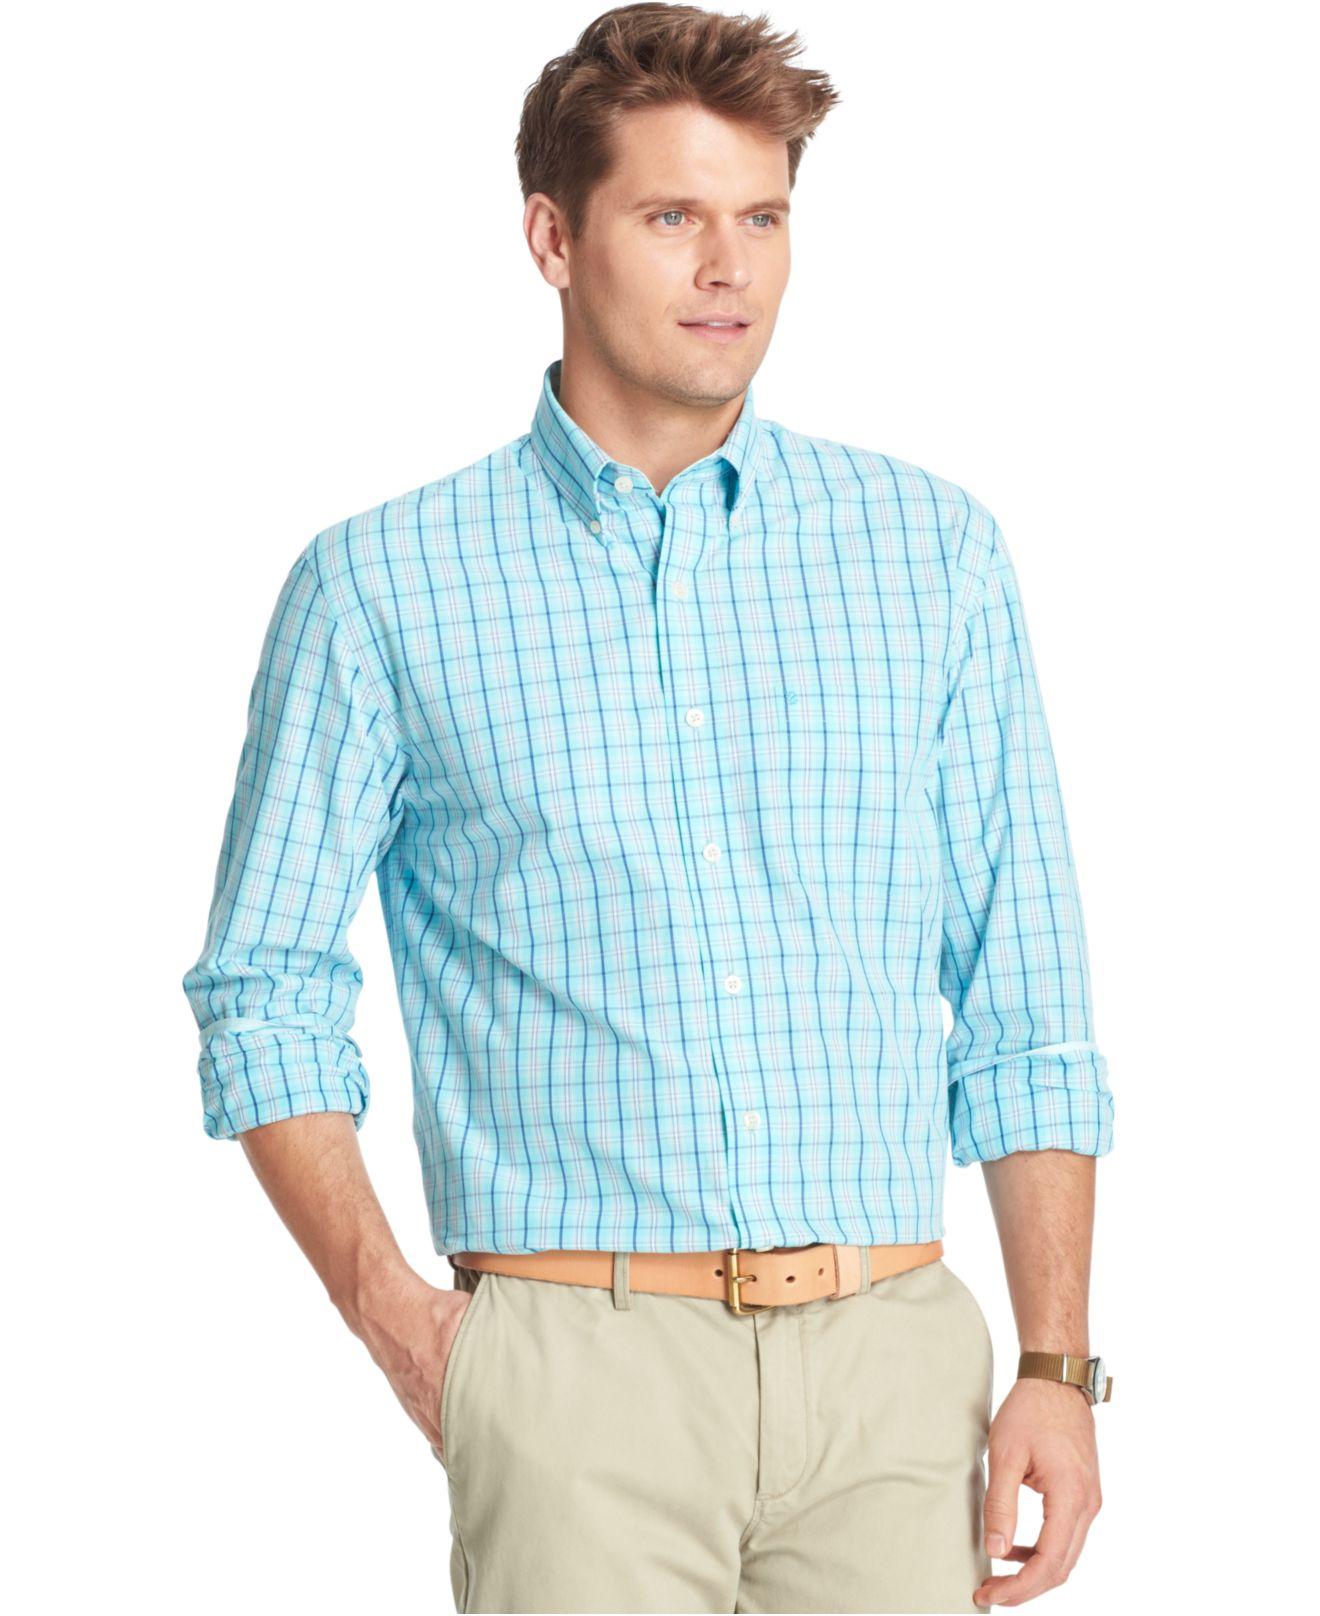 Izod big and tall essential plaid shirt in blue for men lyst for Izod big and tall shirts